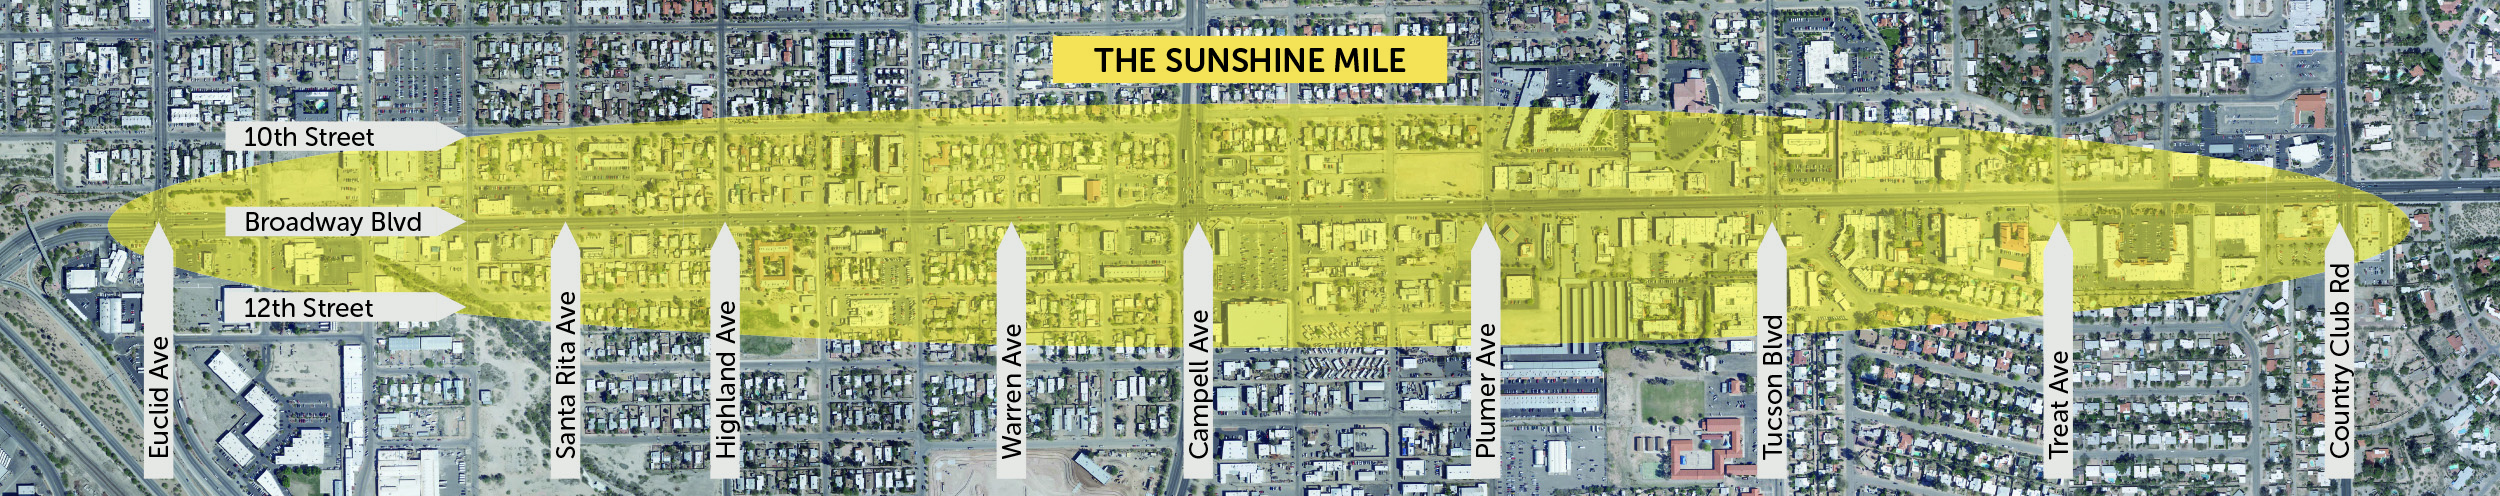 The Sunshine Mile along Broadway Boulevard